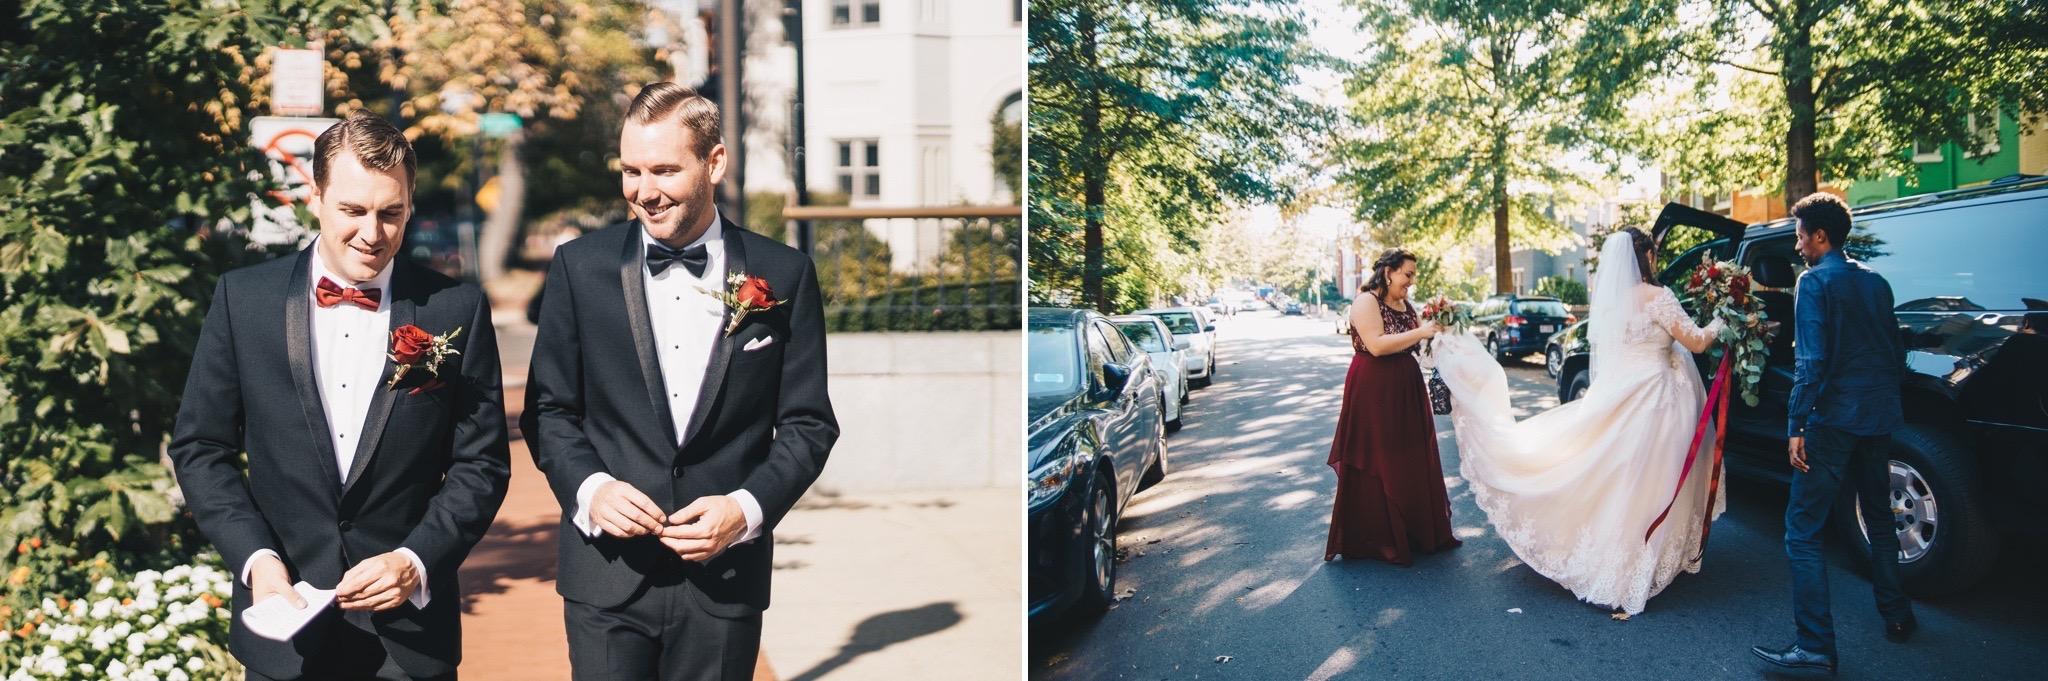 Nathan Elaina Romantic Capitol Wedding in Washington DC by Jonathan Hannah Photography25.jpg